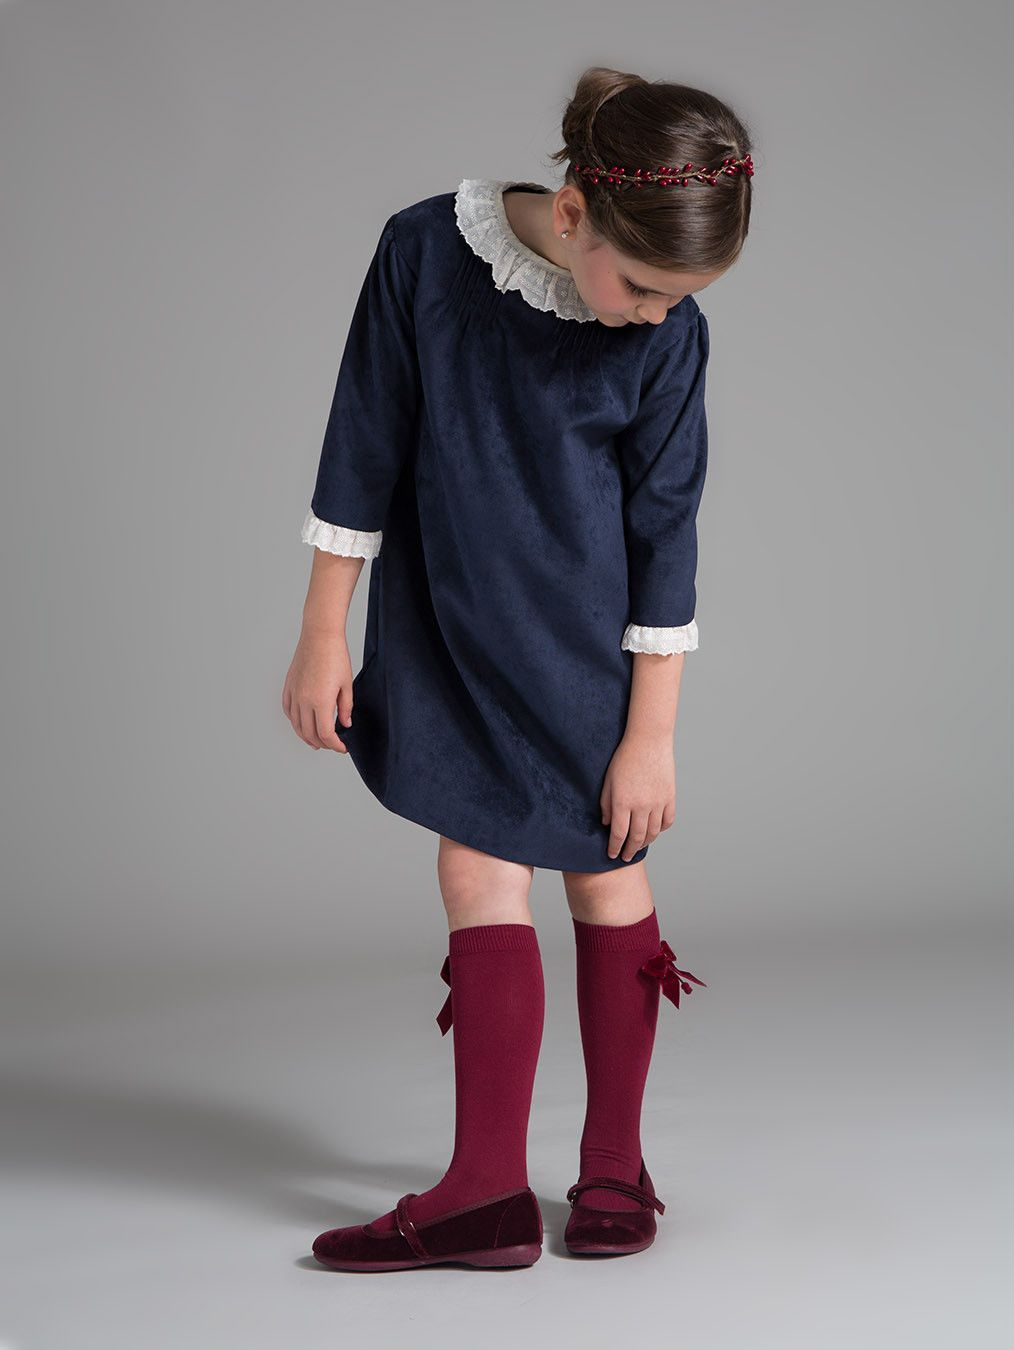 Velvet mod party dress feminine dress plays and child